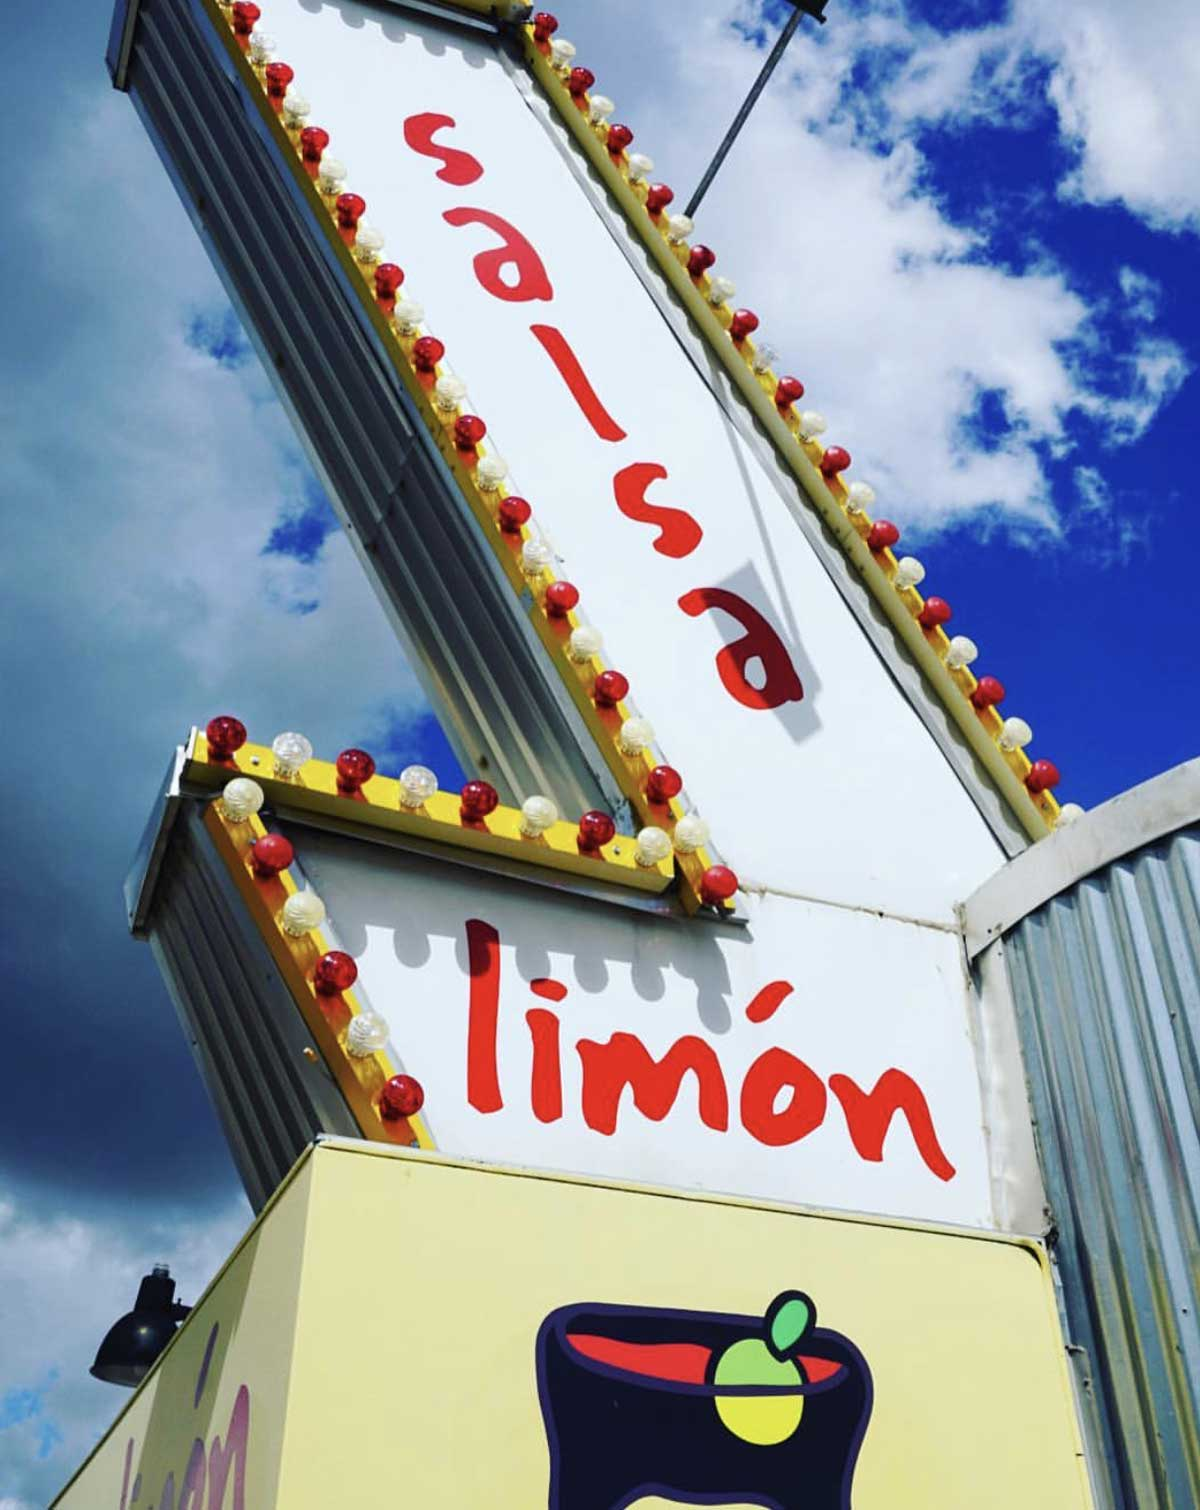 Salsa Limon Universidad Closing Down